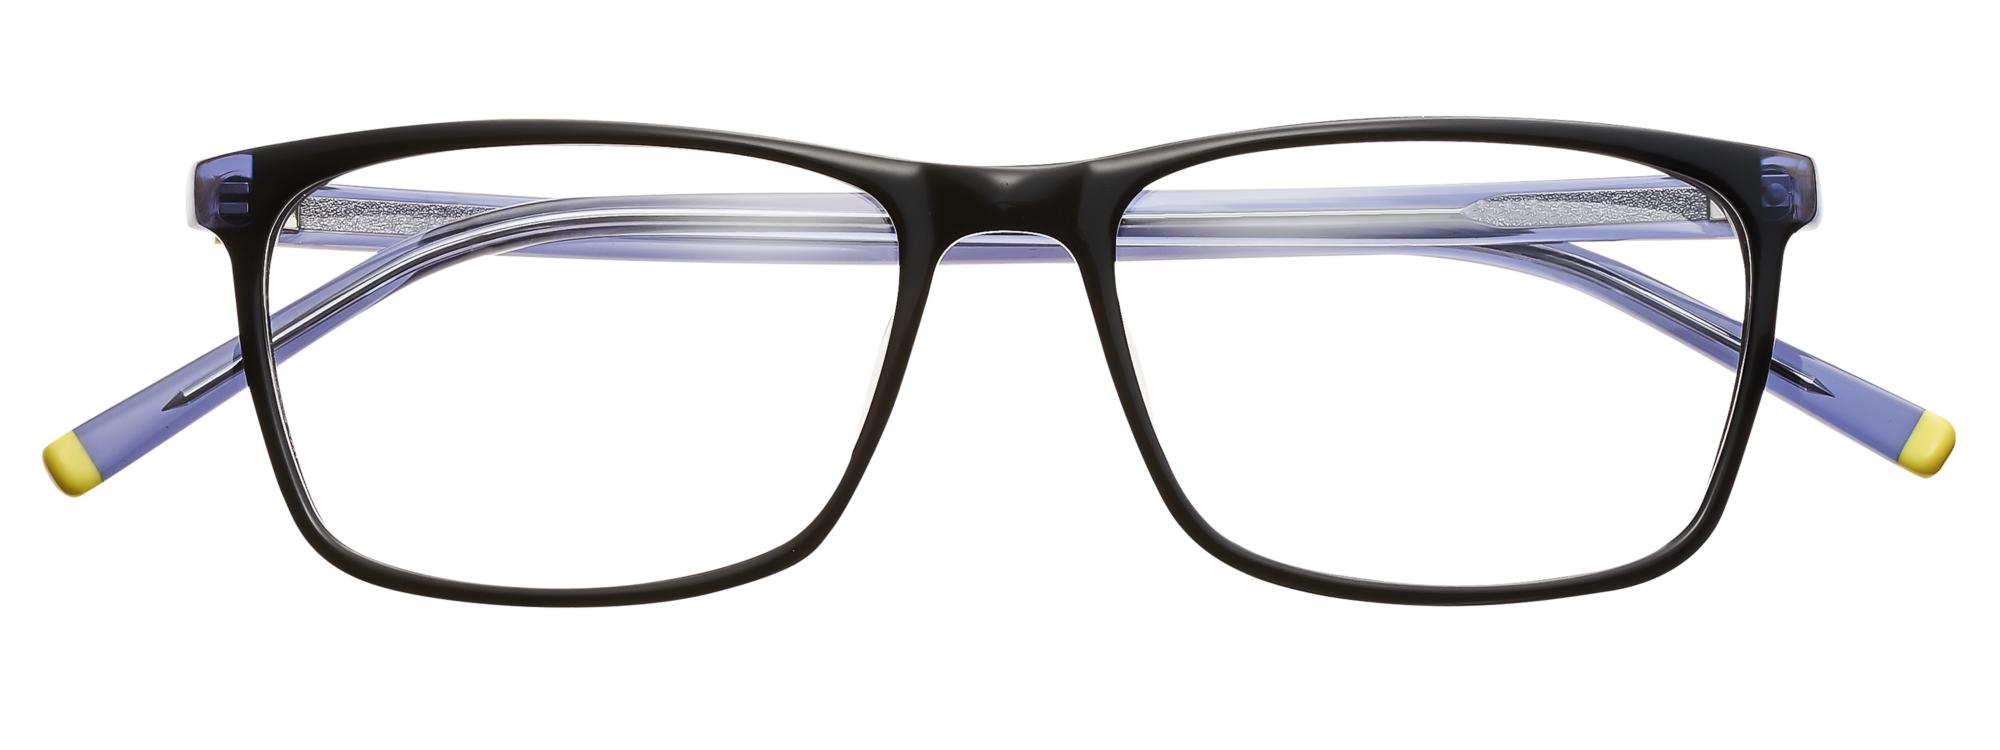 7762df26e3 model 583093 – HUMPHREY´S eyewear